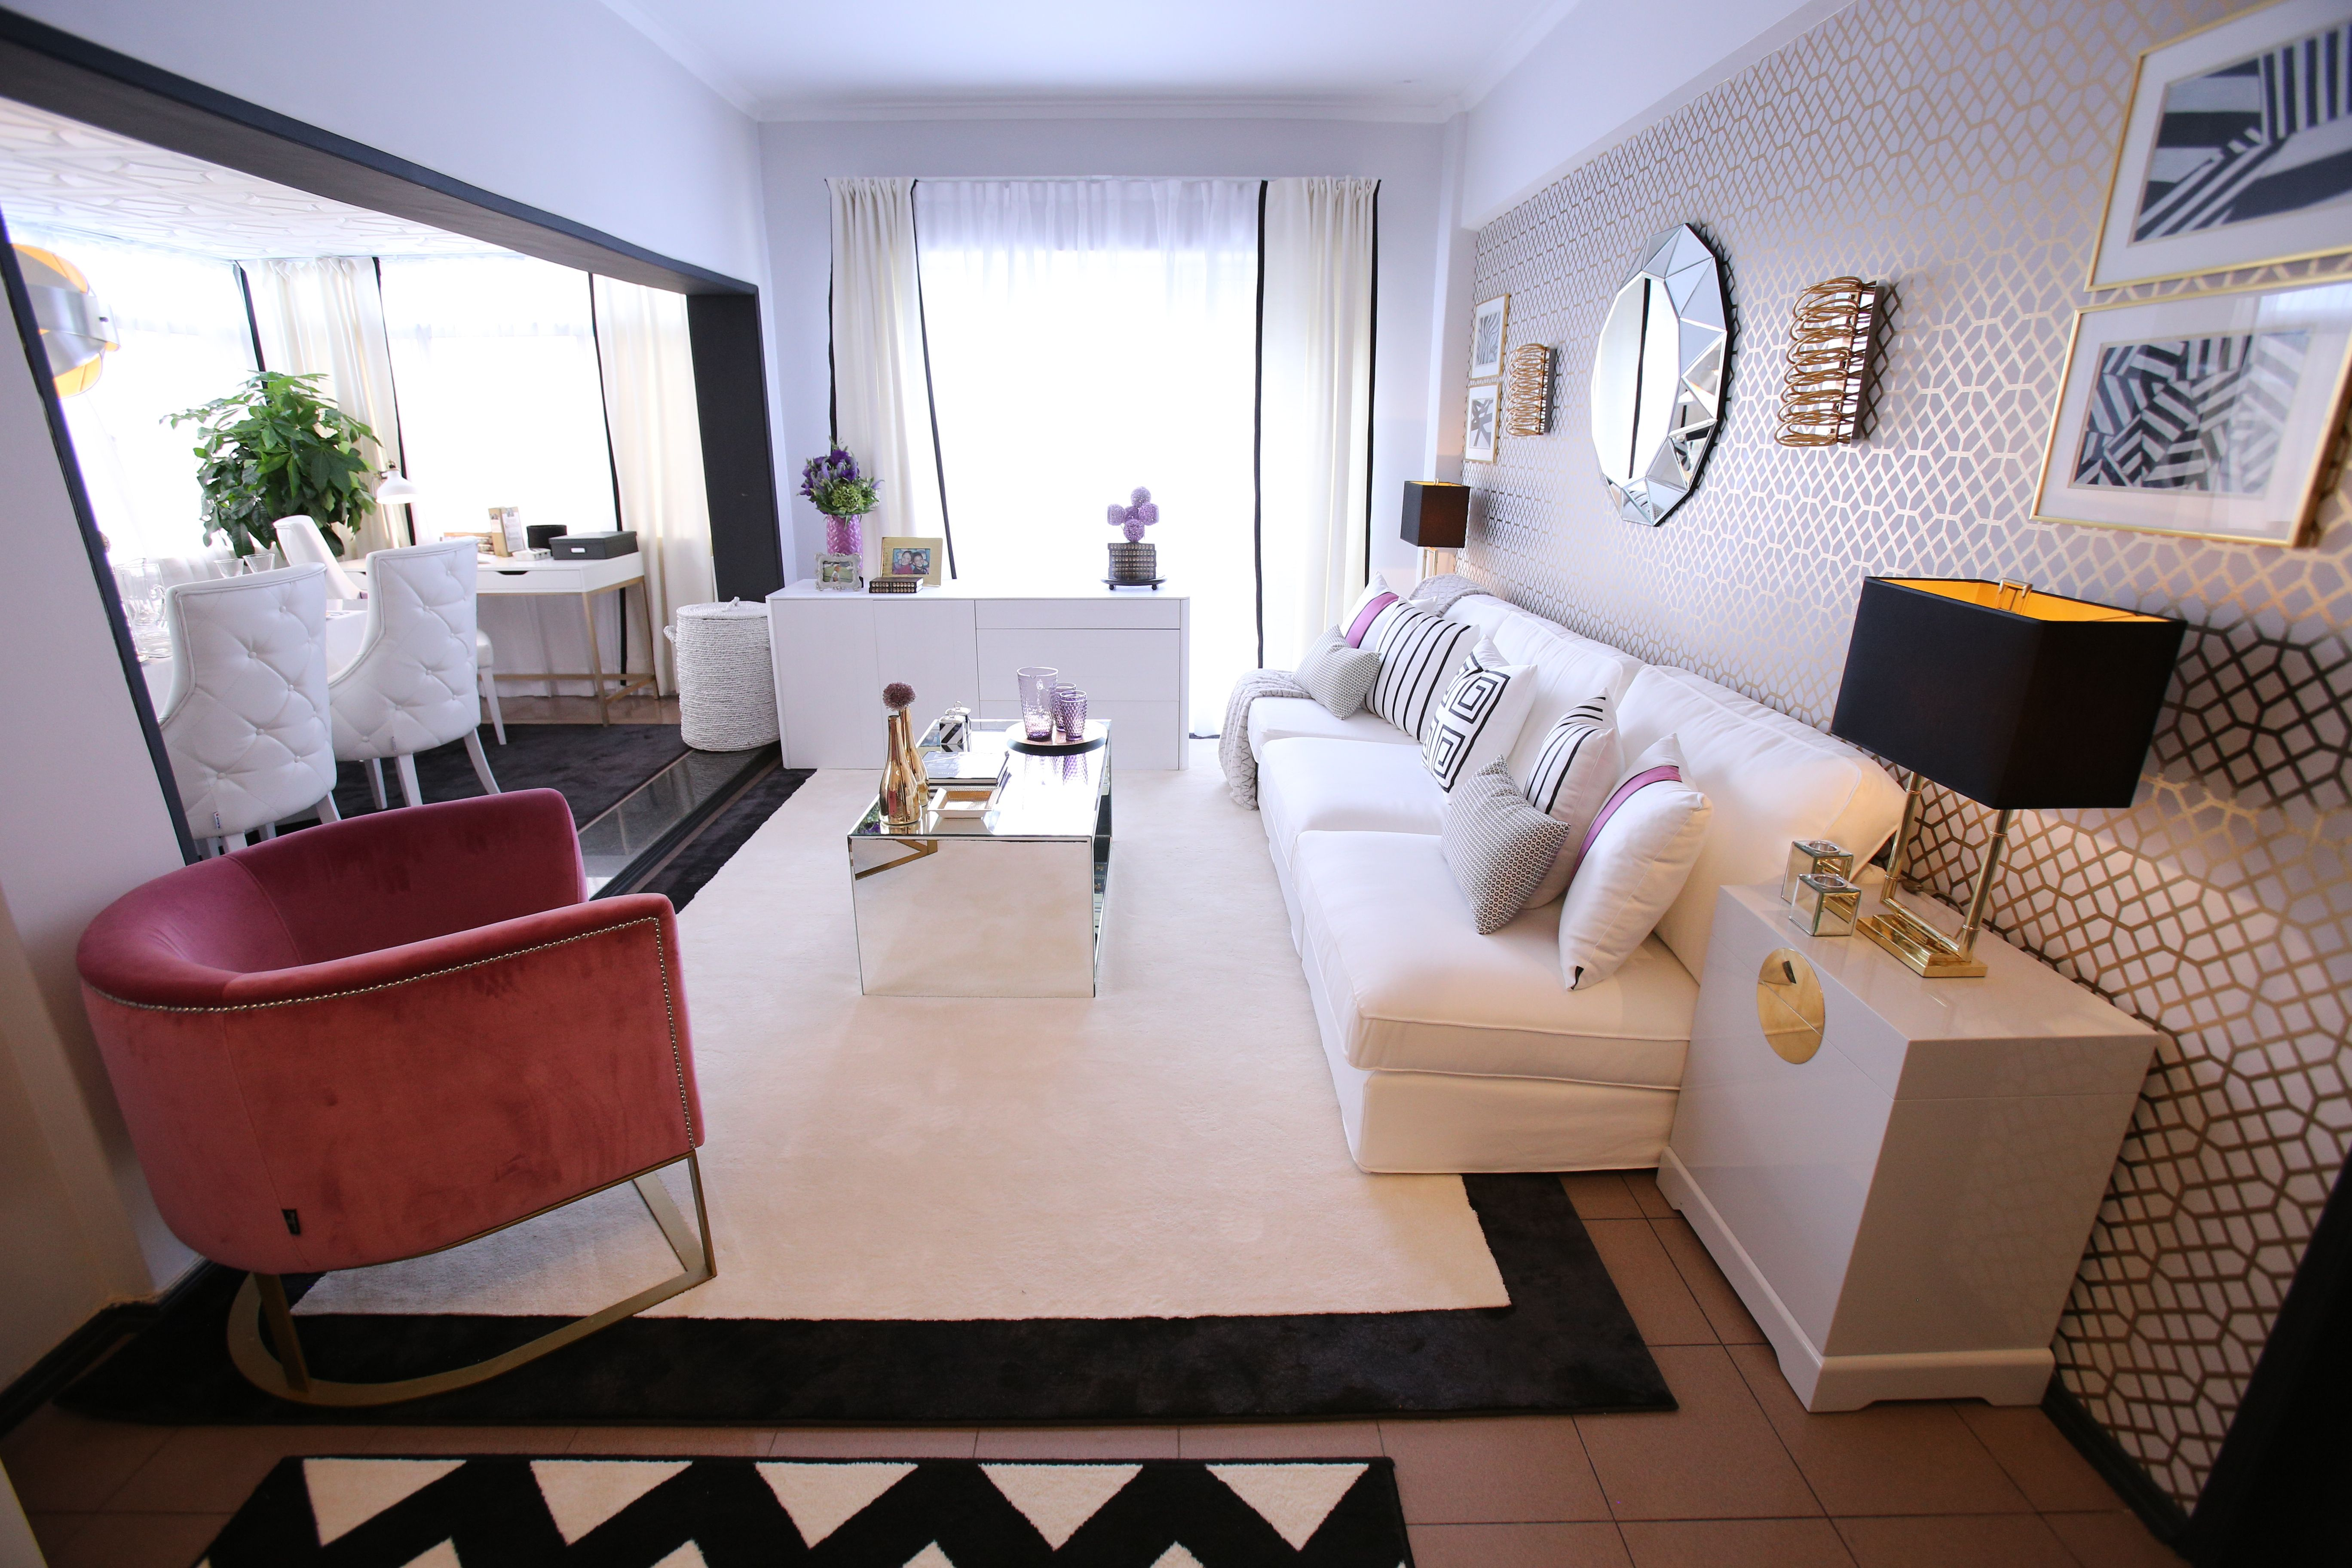 Ana Antunes | Sala De Estar | Living Room | Black White Gold Inspiration |  White Part 50